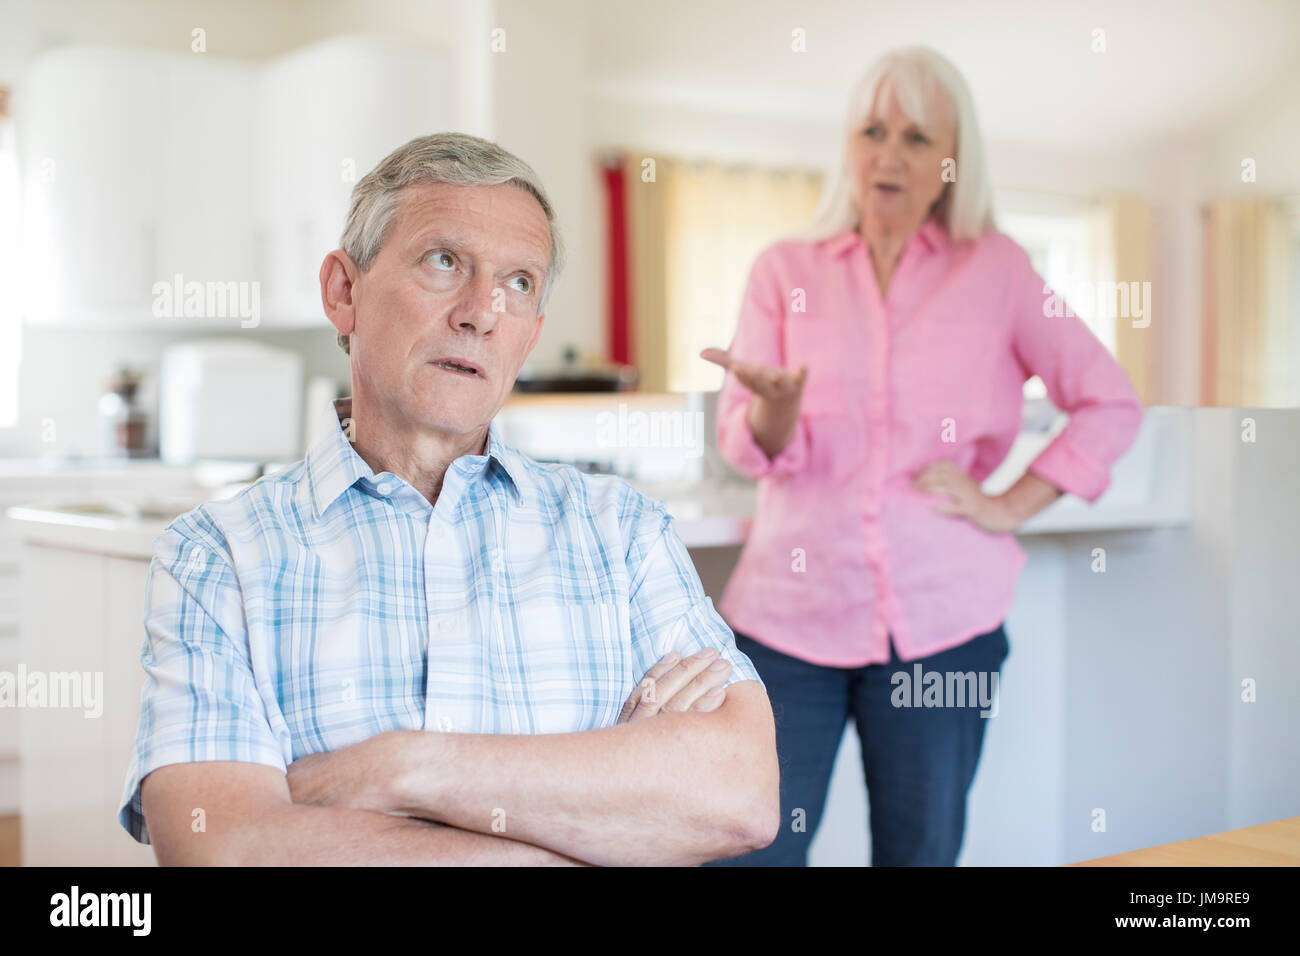 Senior Couple Having Argument At Home - Stock Image